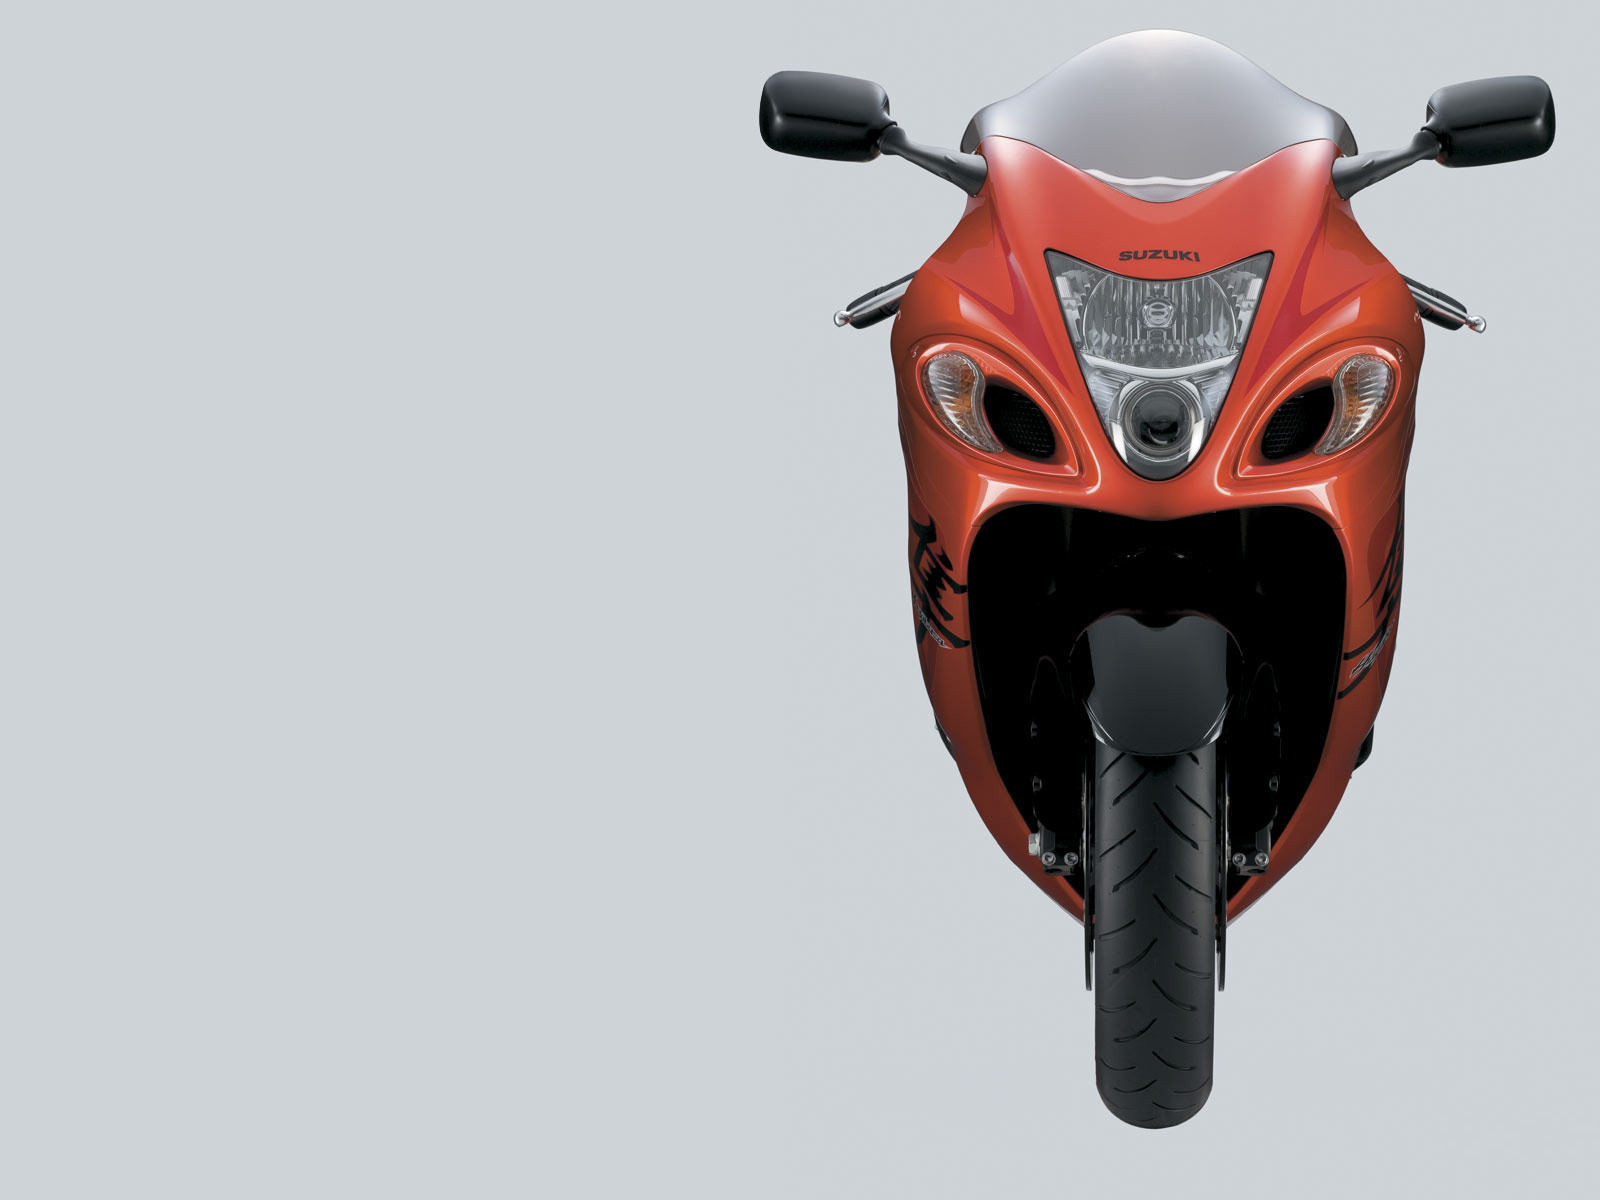 2008 Gsx1300r Hayabusa Suzuki Motorcycle Photos